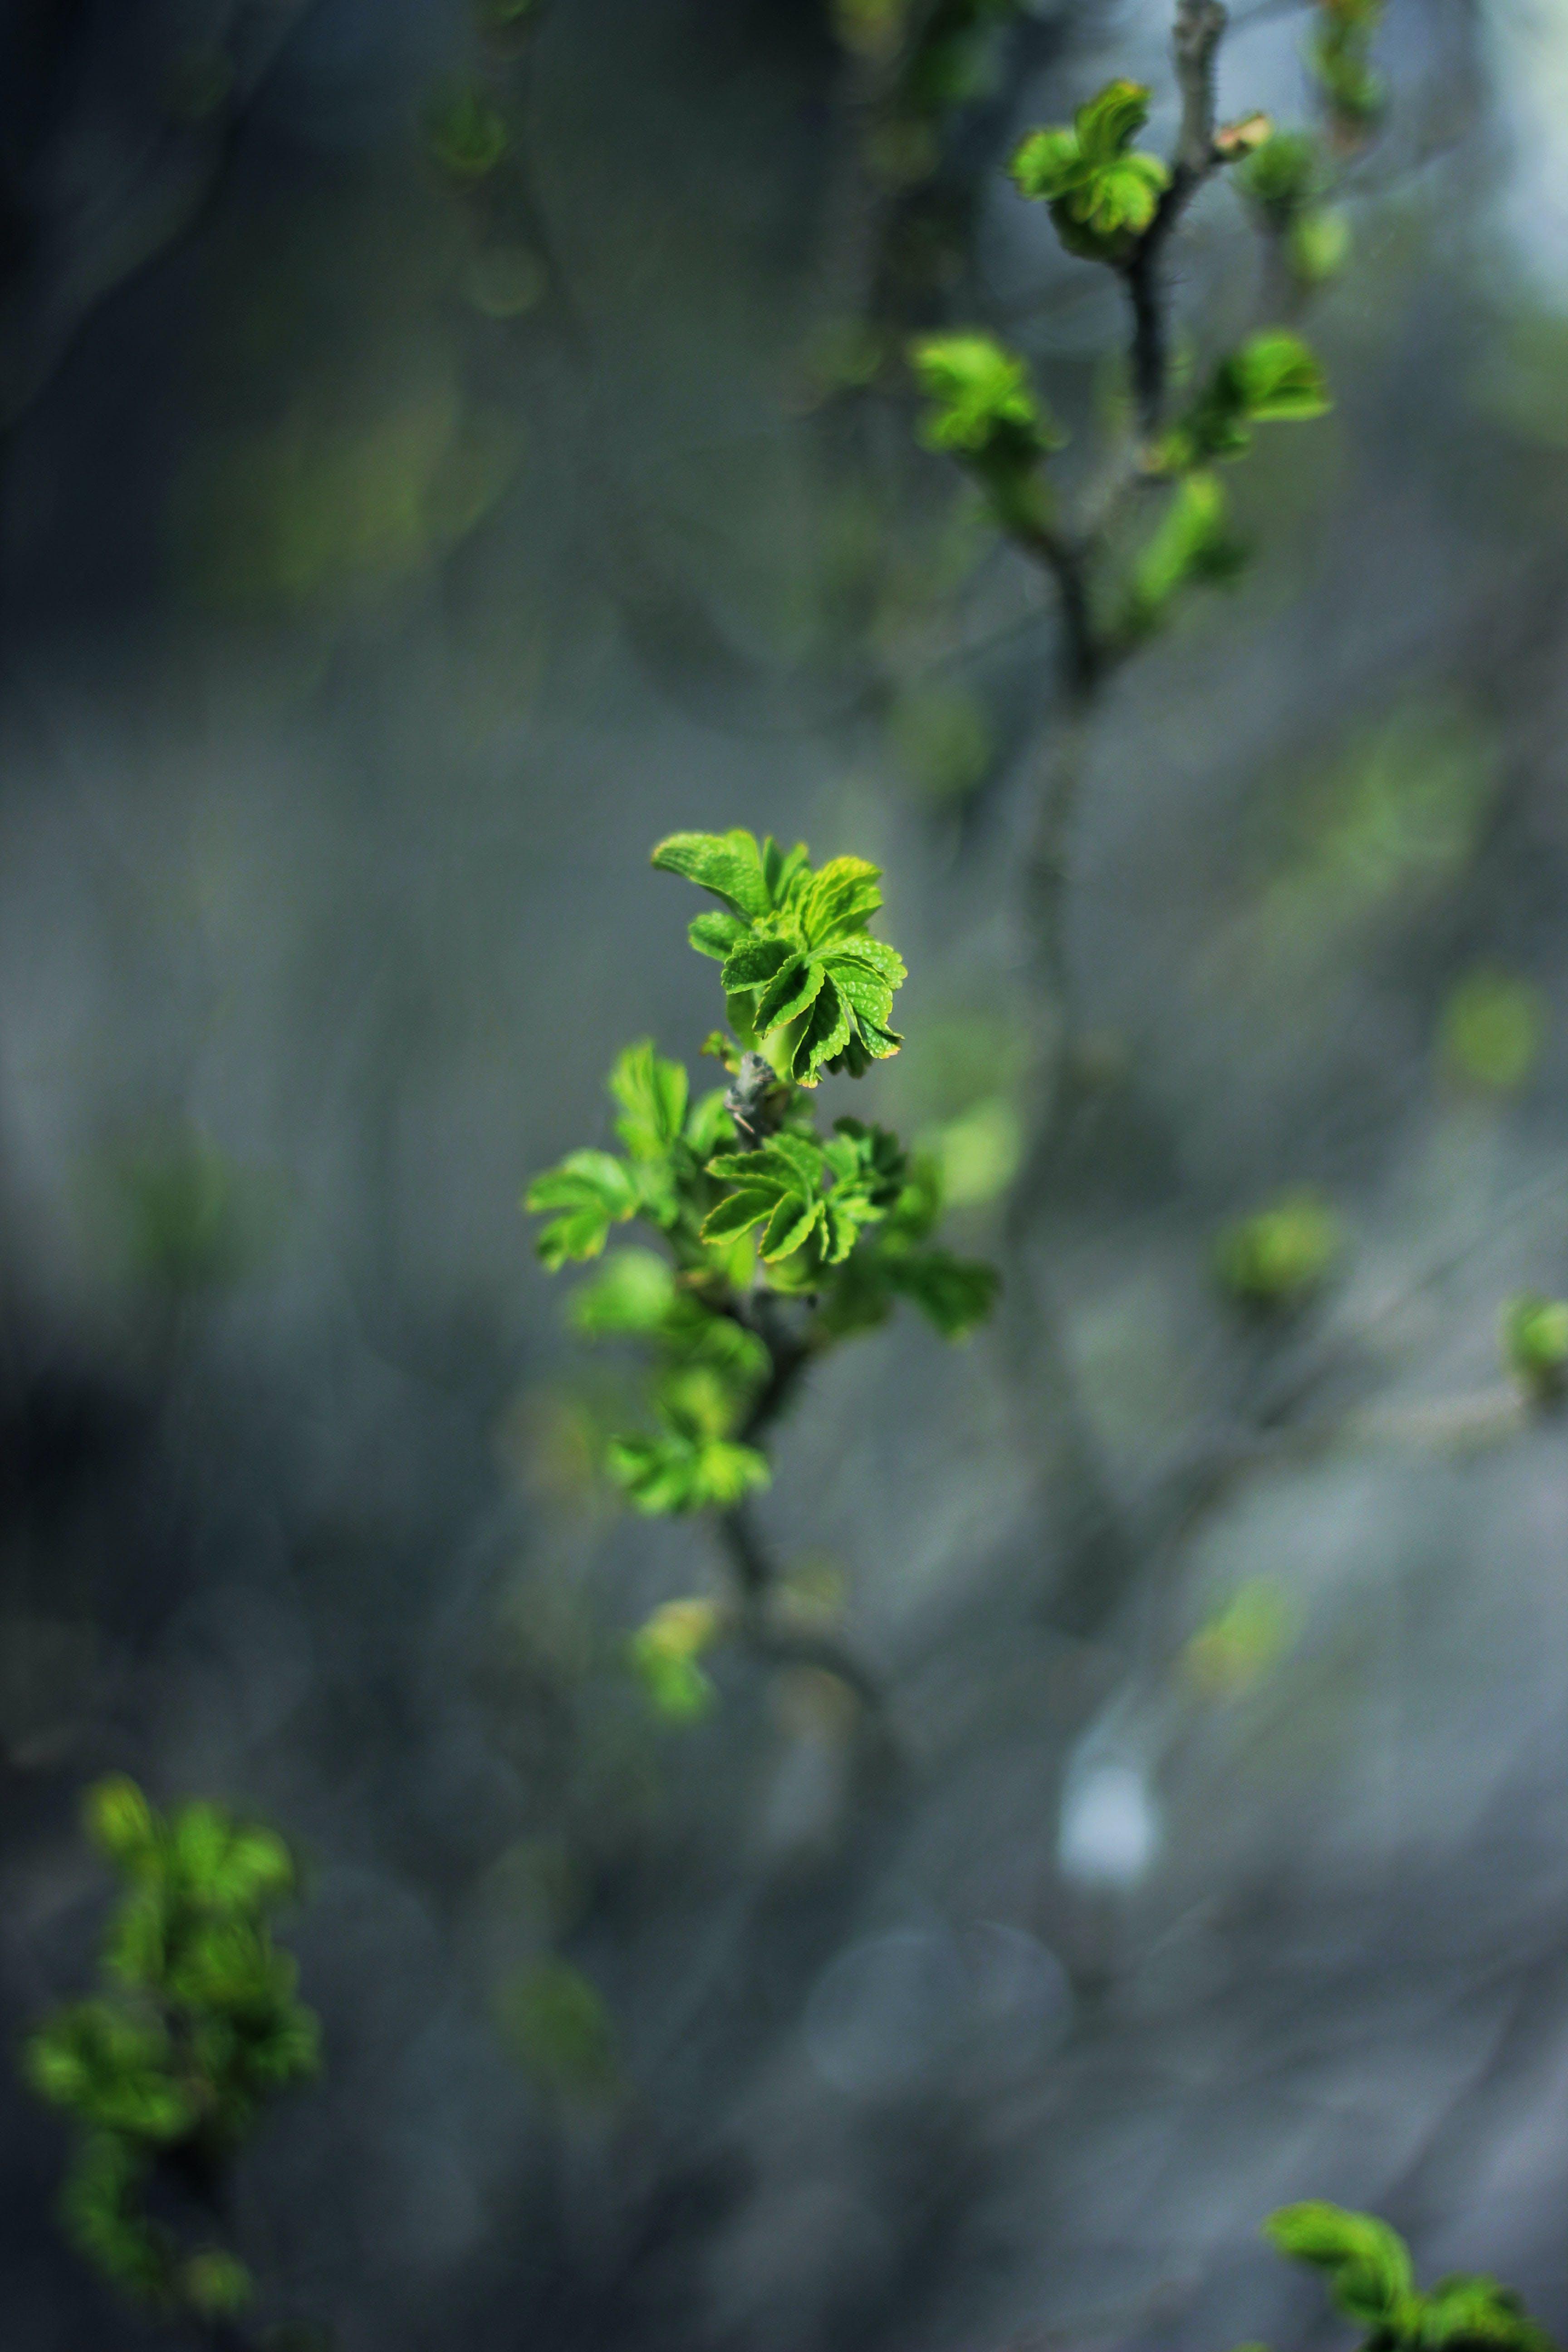 Kostenloses Stock Foto zu natur, pflanze, blätter, grün